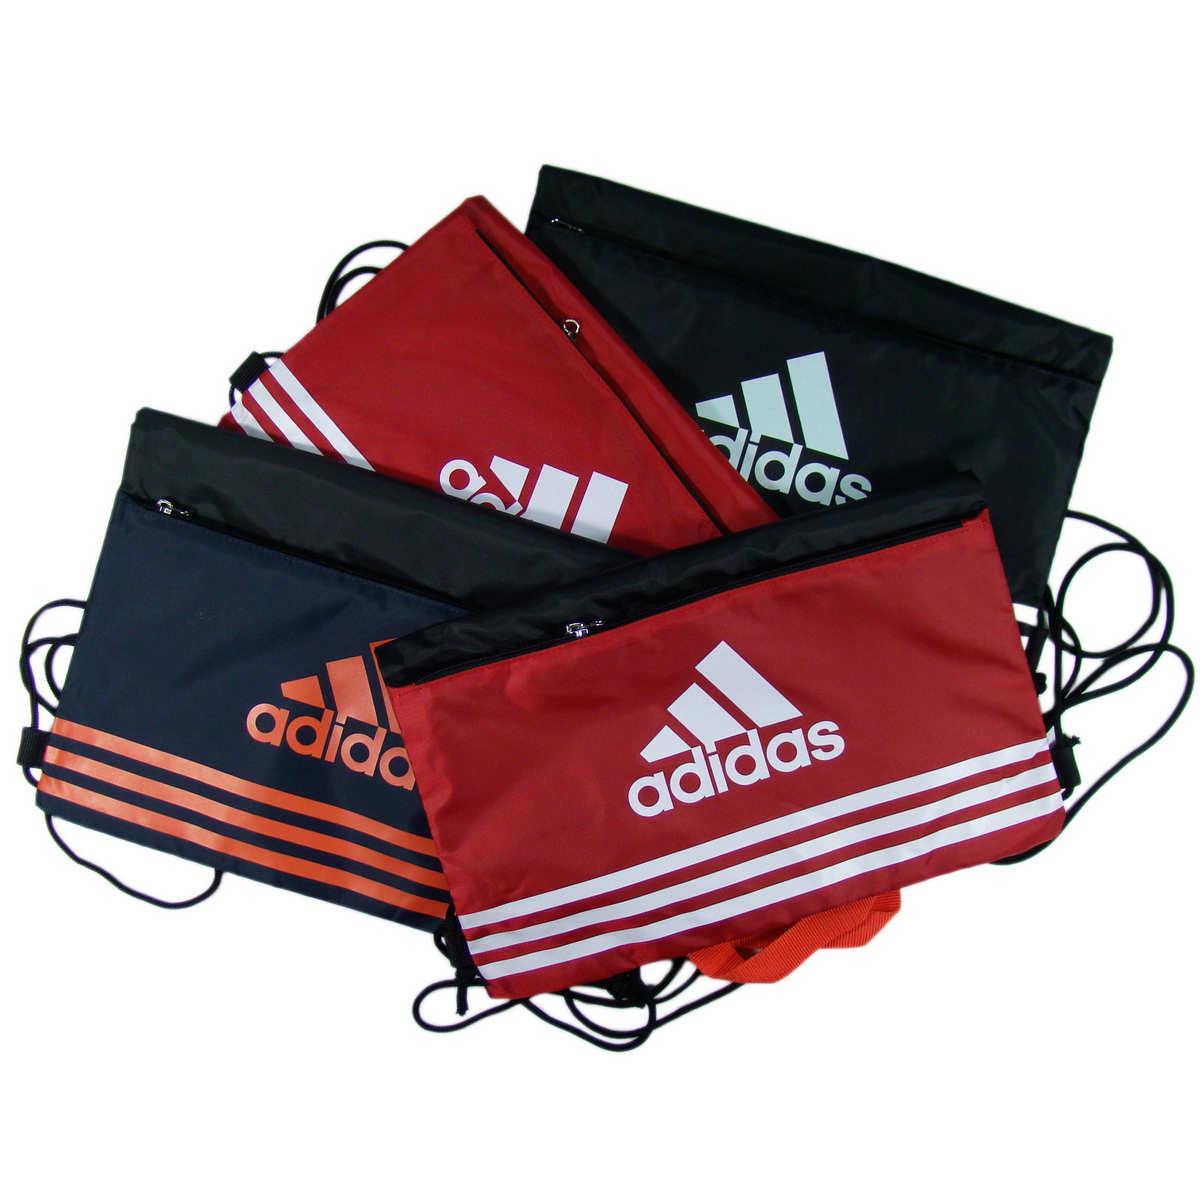 Туристический рюкзак Adidas adjh160 рюкзак adidas 0362